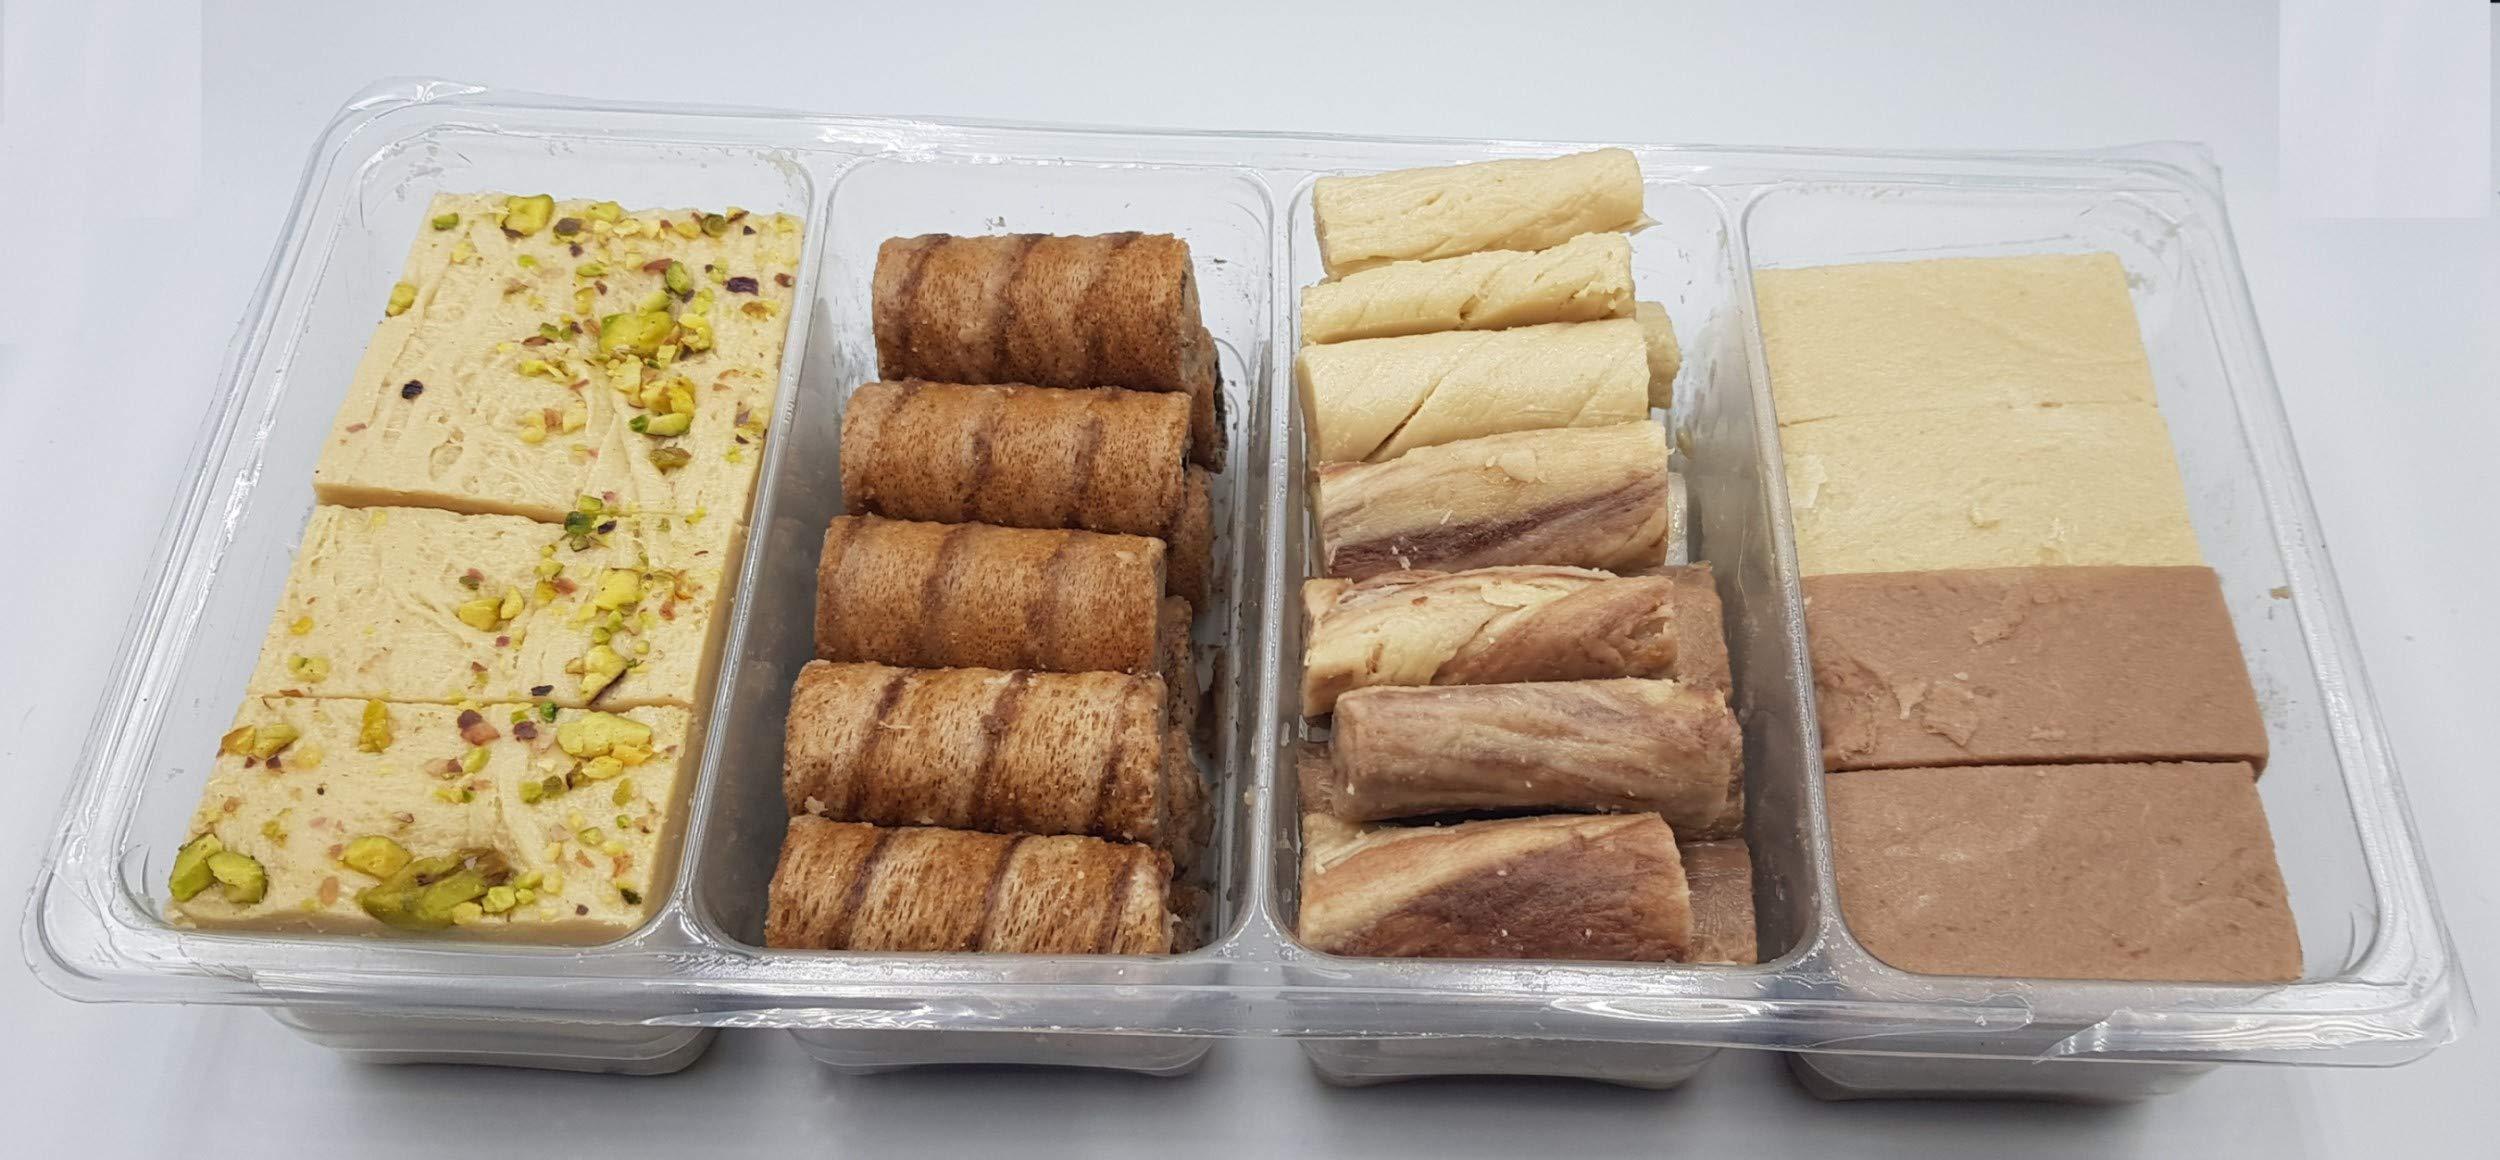 Artisanal Halvah Bars Assorted - 5 Varieties: Pistachio, Marble & Plain - Tahini Halvah Bars (1.8 lbs, 30 Oz, 800 Grams NET, 85-90 Pcs, 4 Layers) Halawa - Flaky Turkish Halva Very Classy Box by Turkish Delight (Image #3)